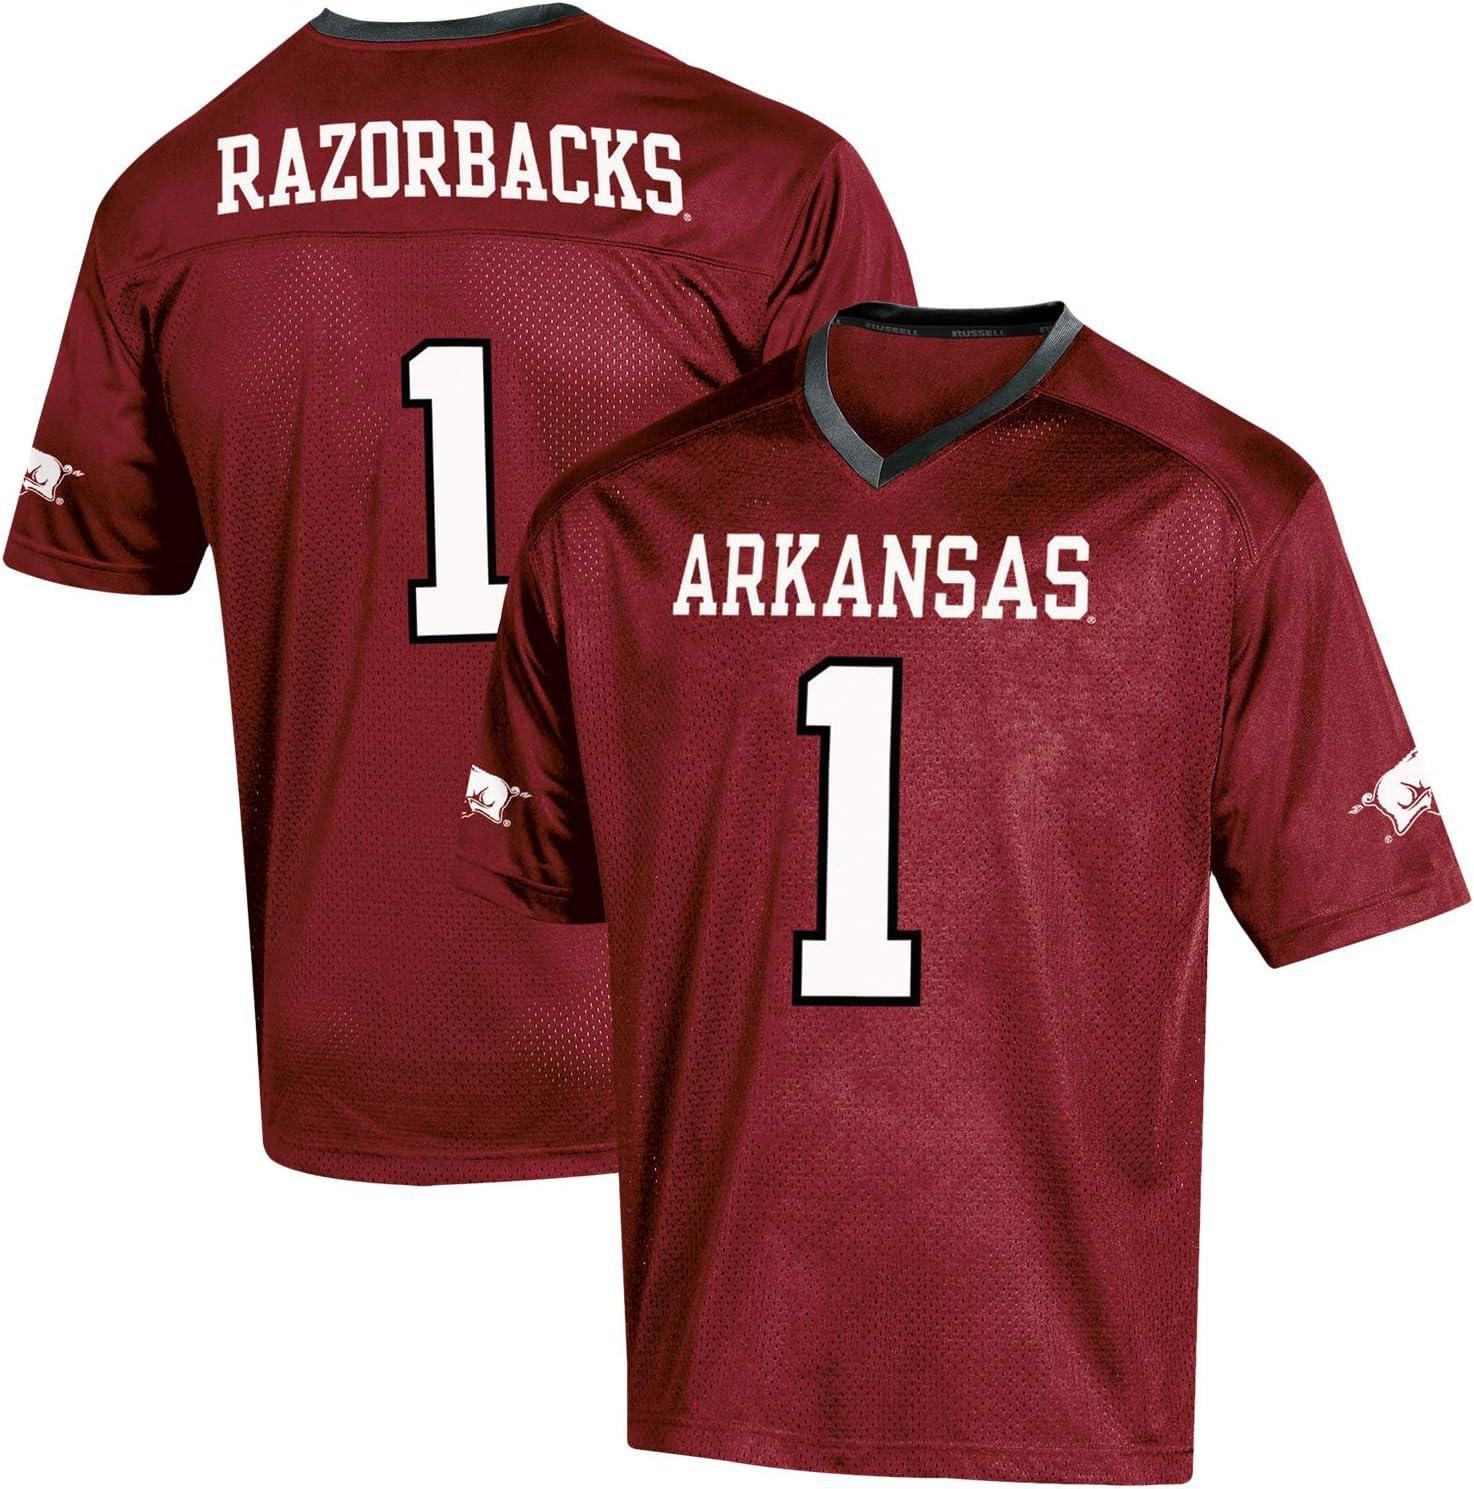 arkansas razorback football jersey